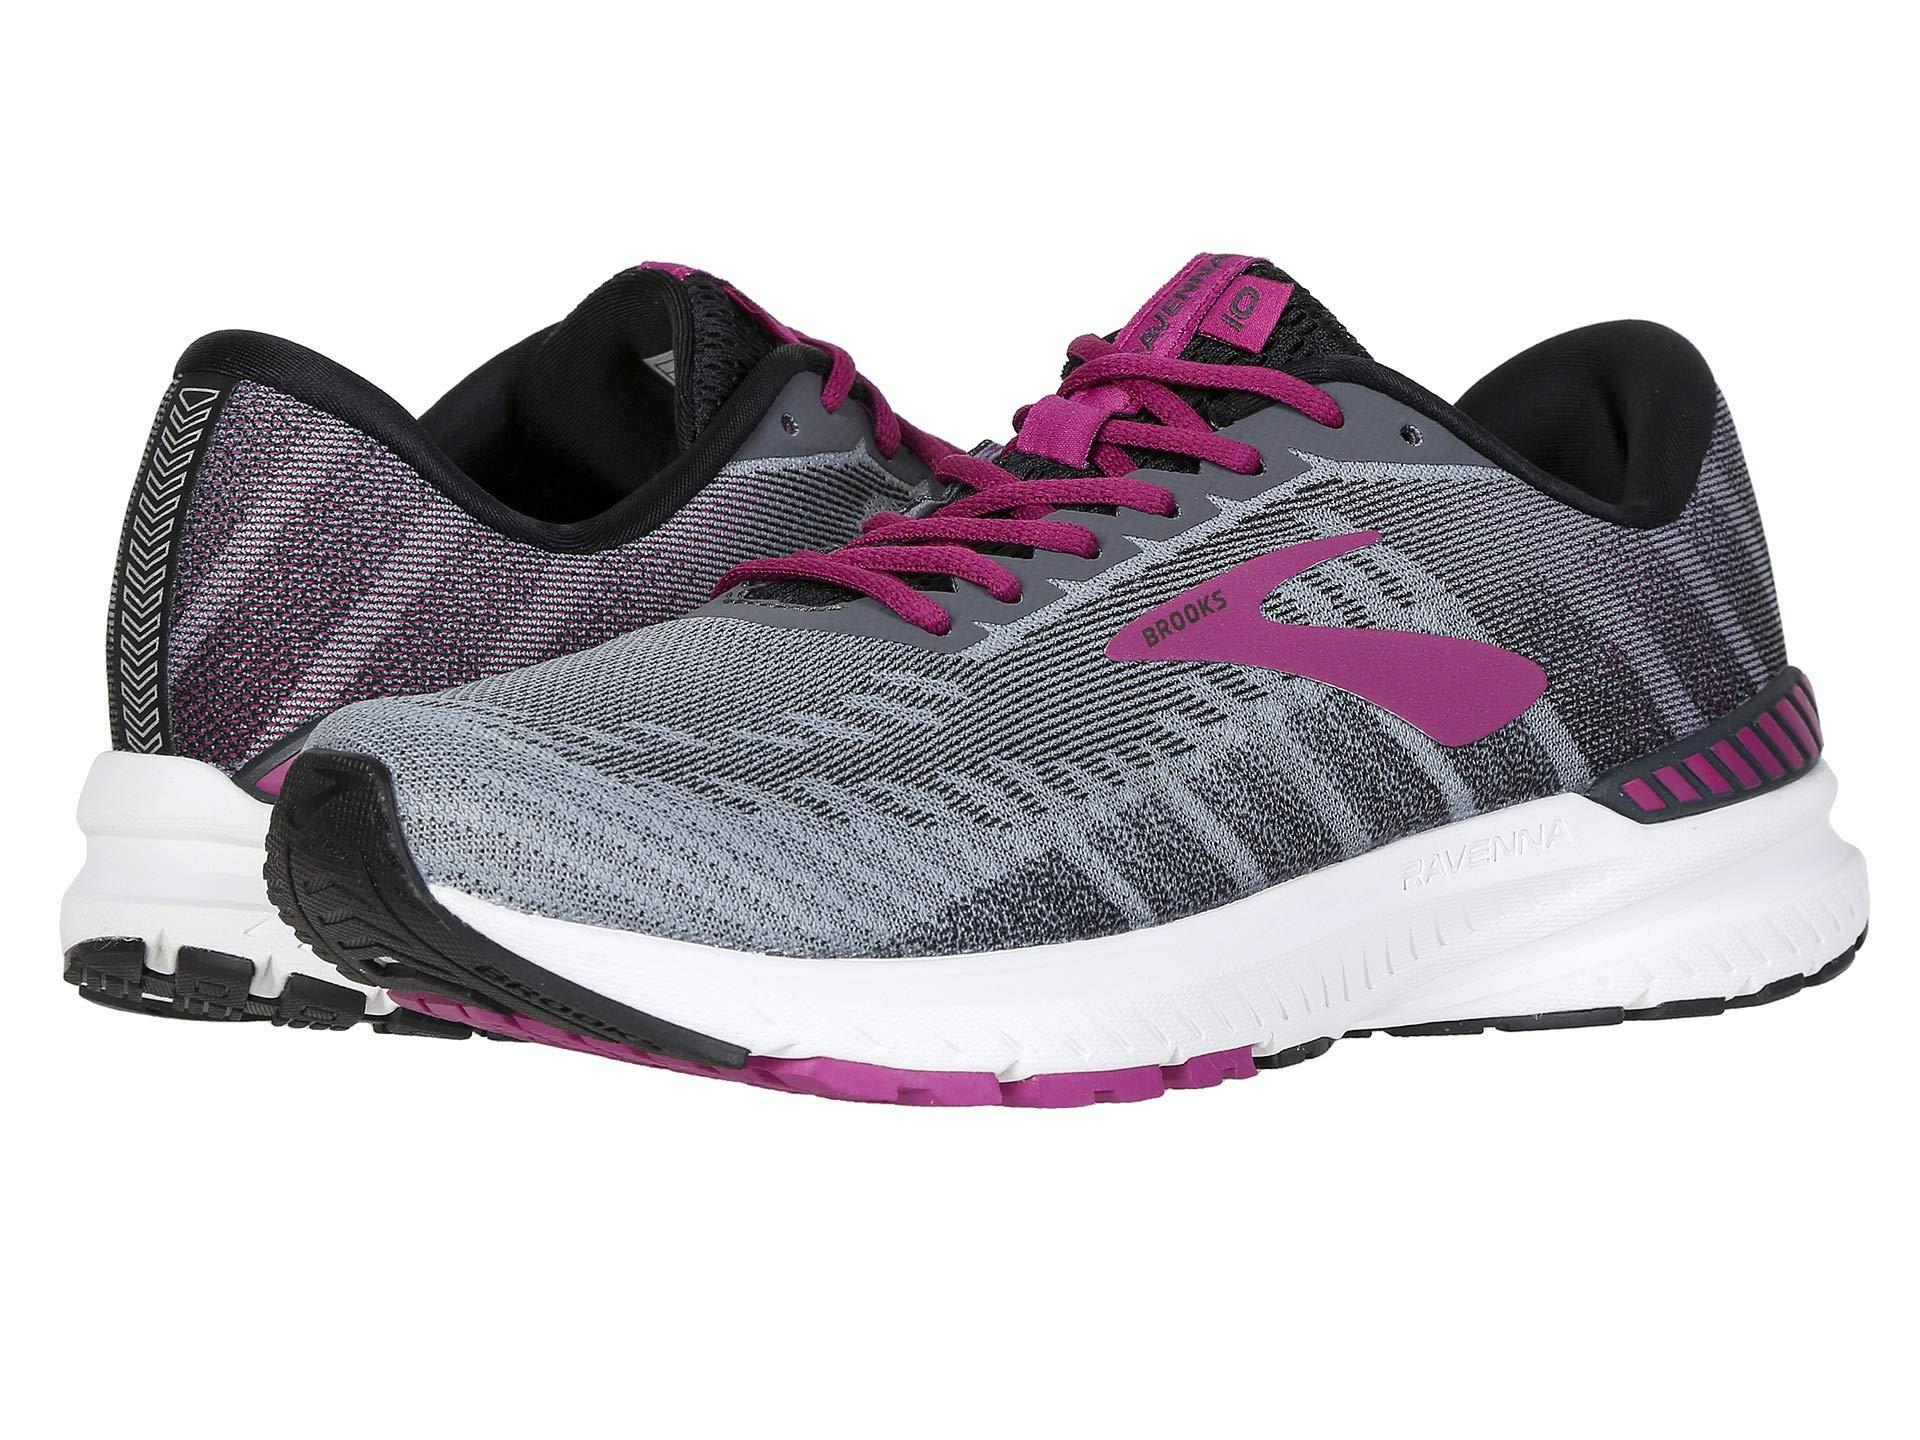 3f81fb539 Brooks - Ravenna 10 (ebony/black/wild Aster) Women's Running Shoes -. View  fullscreen